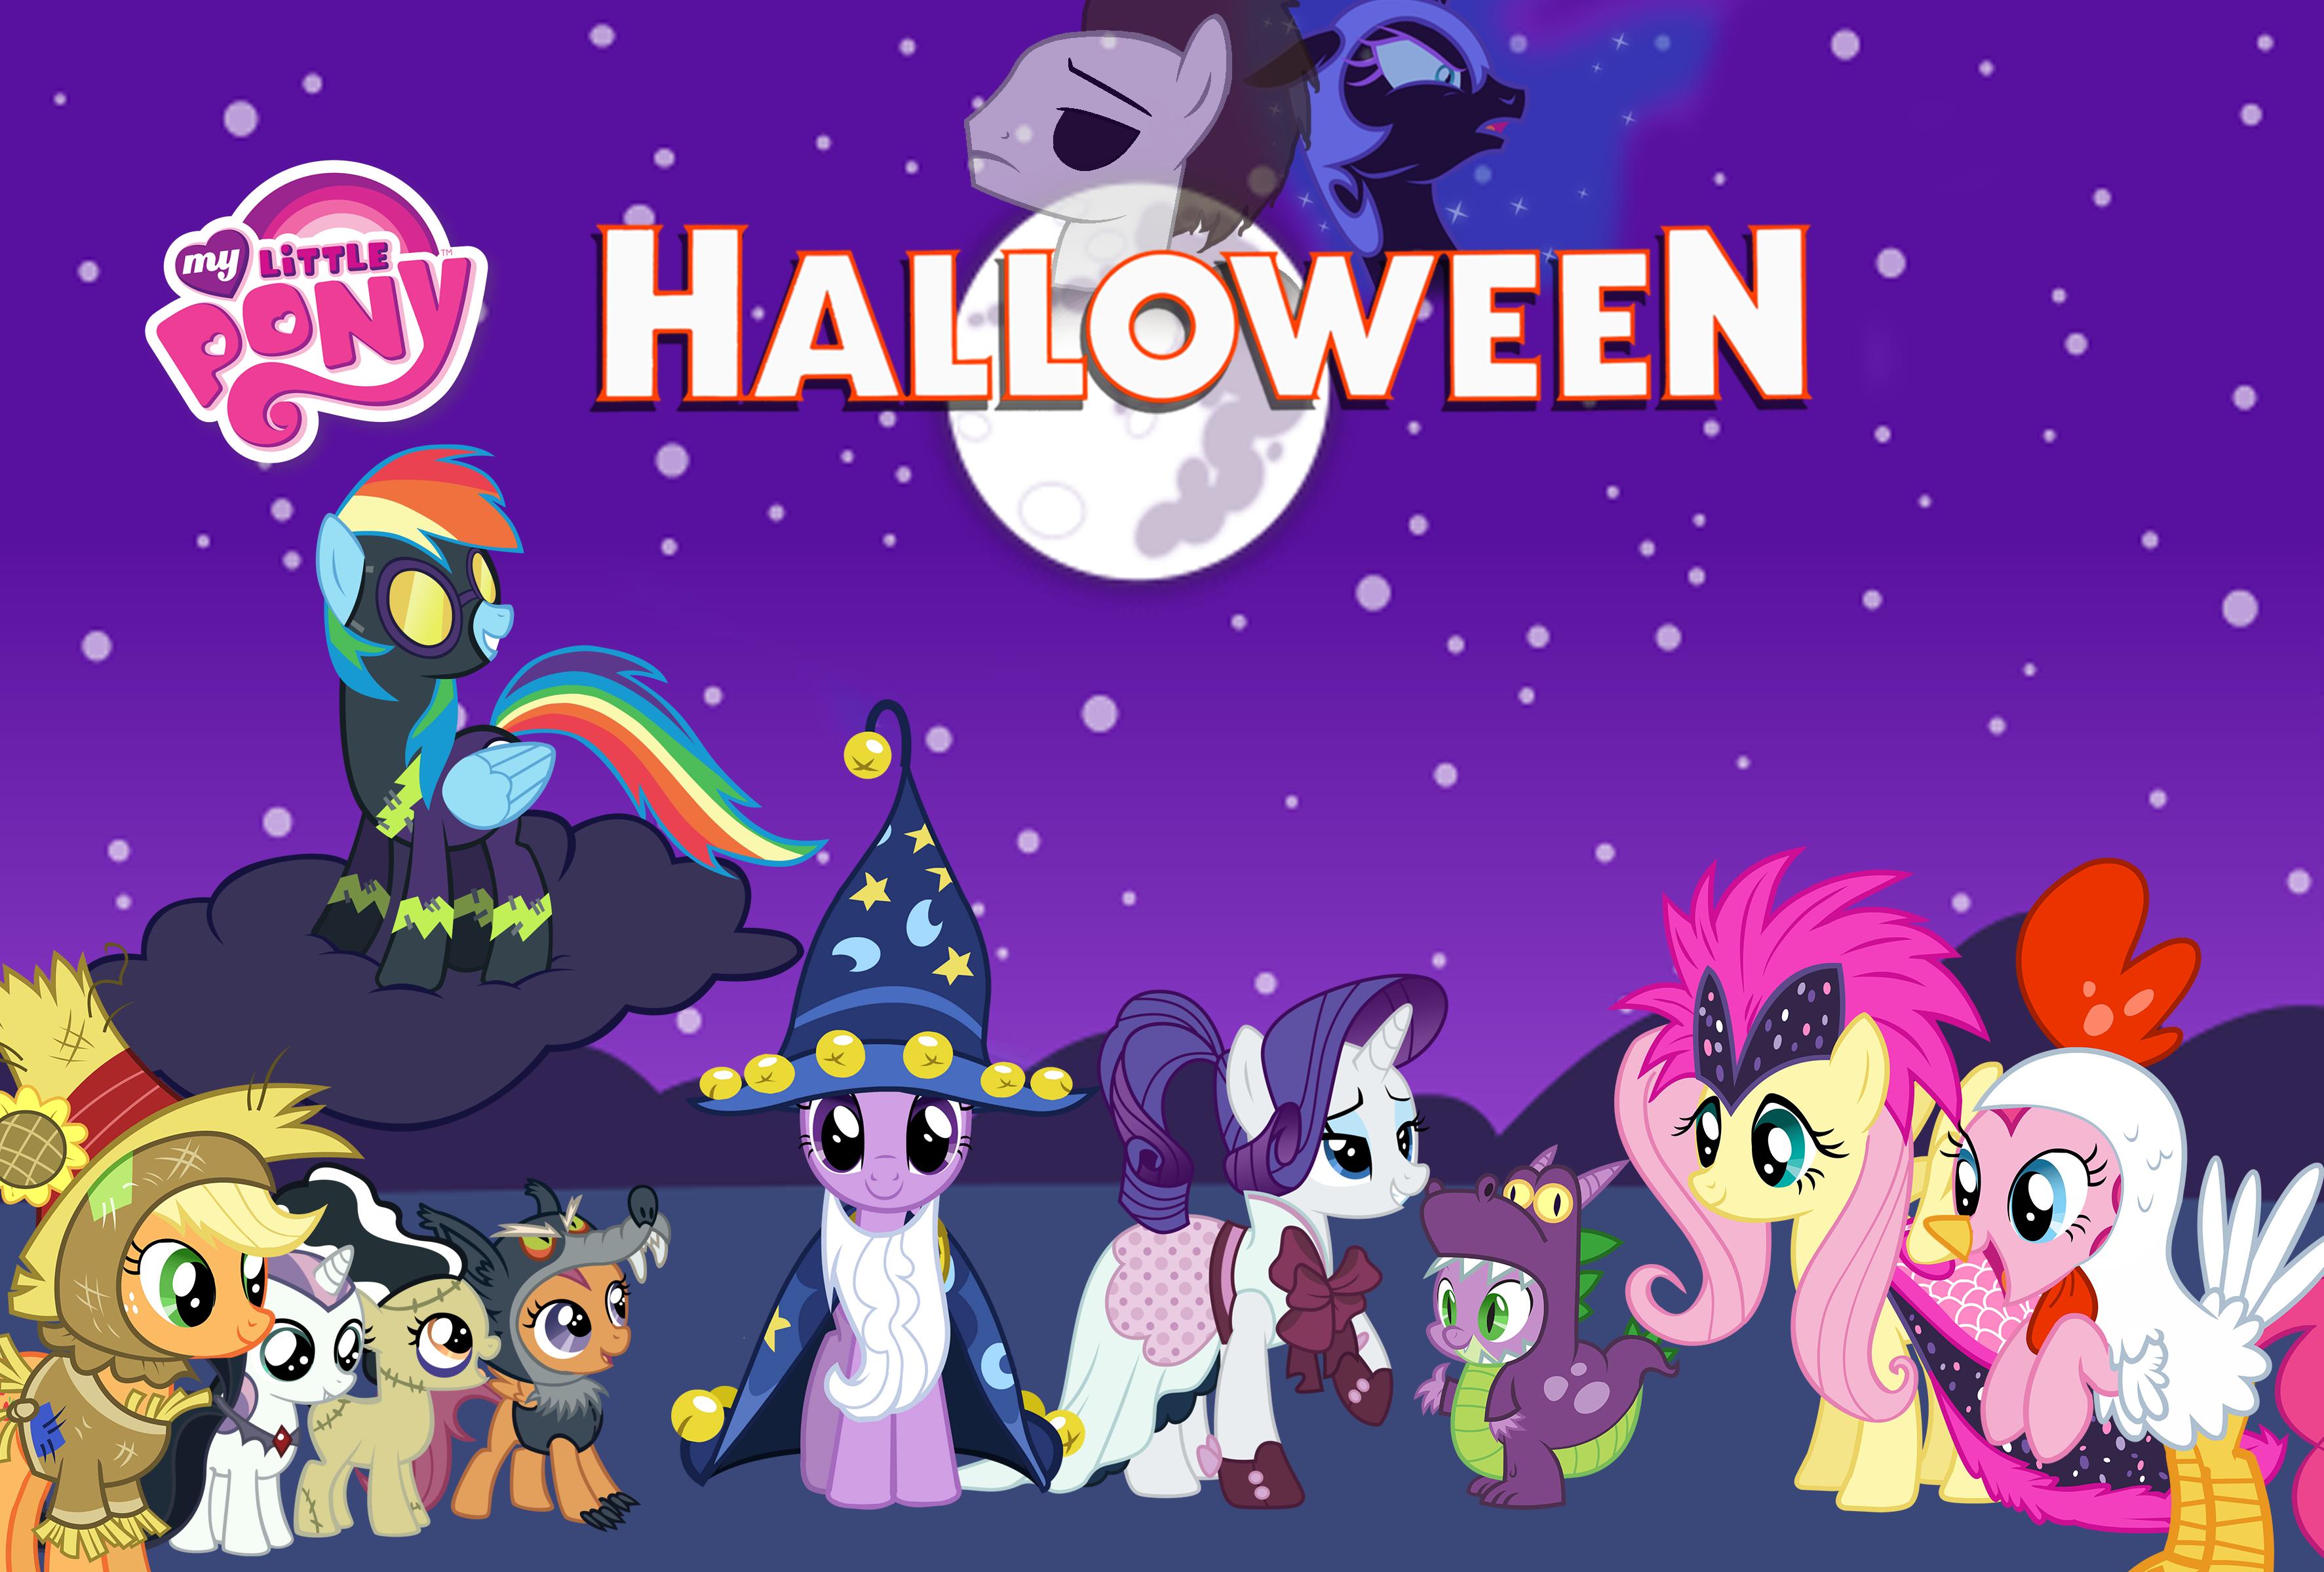 Mlp Halloween Special 2020 MLP Halloween by KayMan13 on DeviantArt